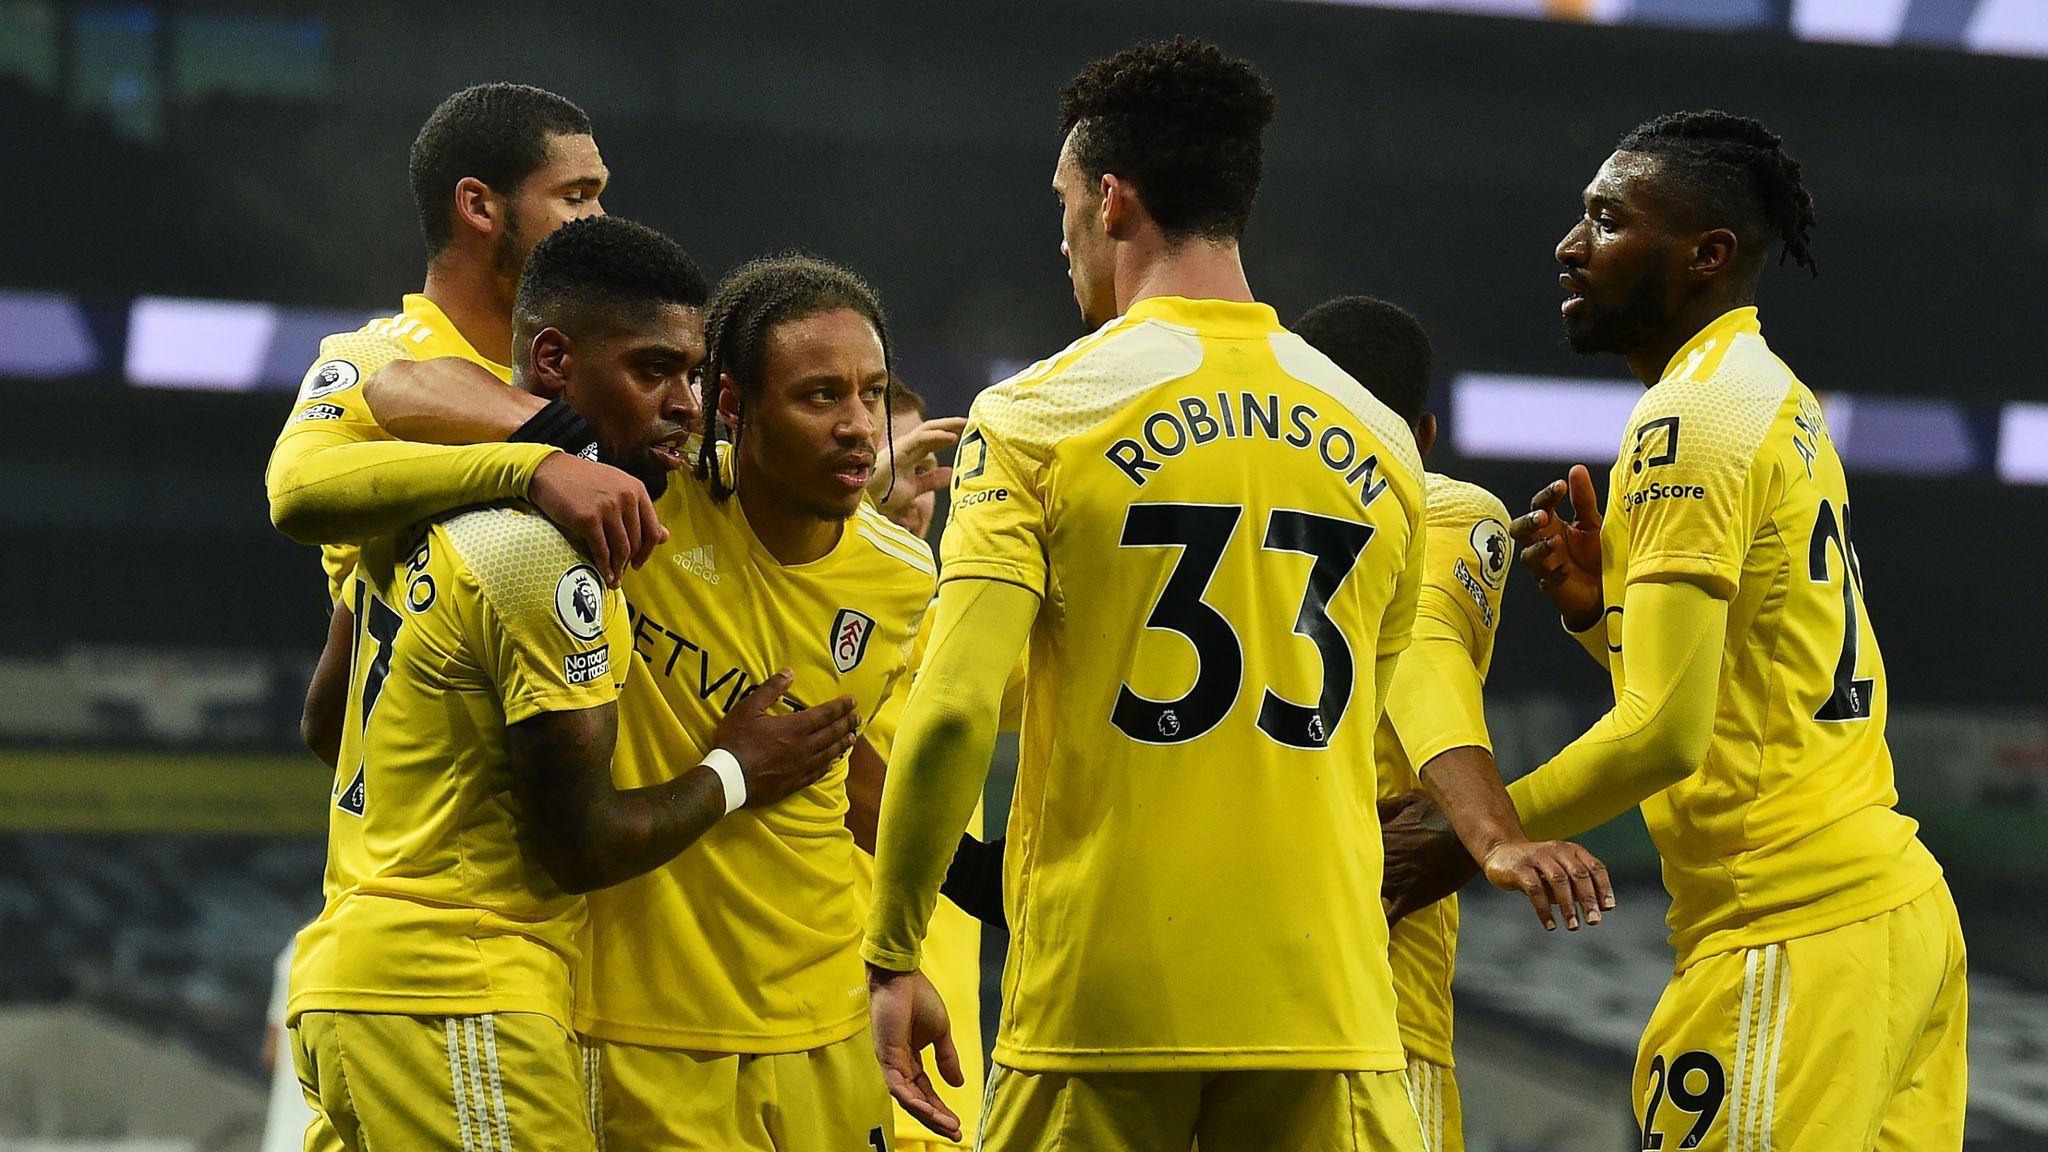 Tottenham 1-1 Fulham: Ivan Cavaleiro equalises as Spurs drop more points | Football News | Sky Sports